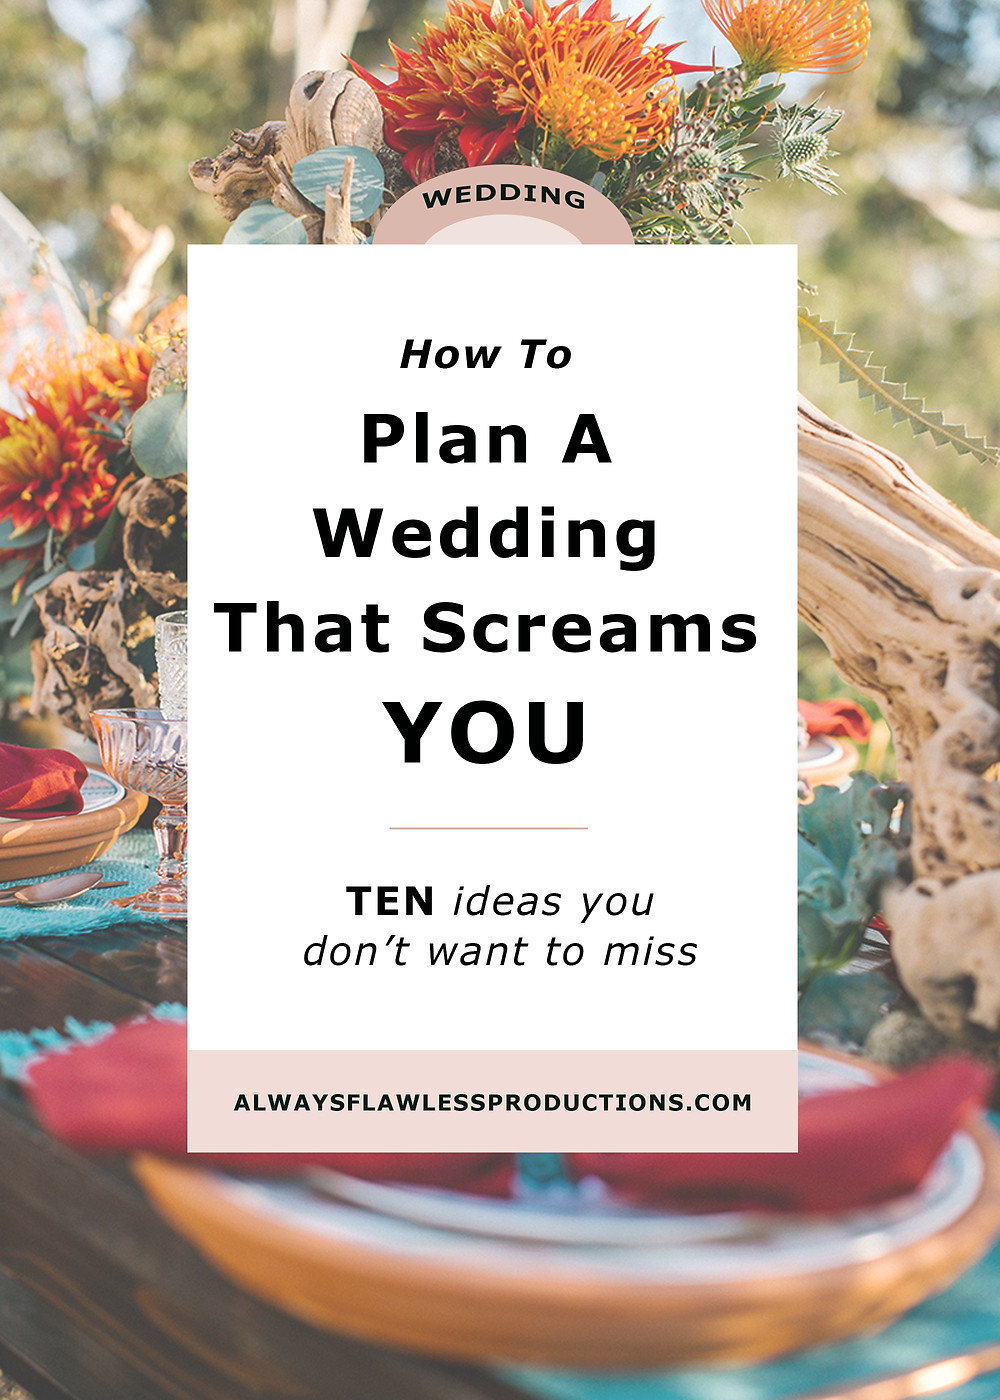 Wedding Design - Unique wedding ideas to create  a personalized wedding